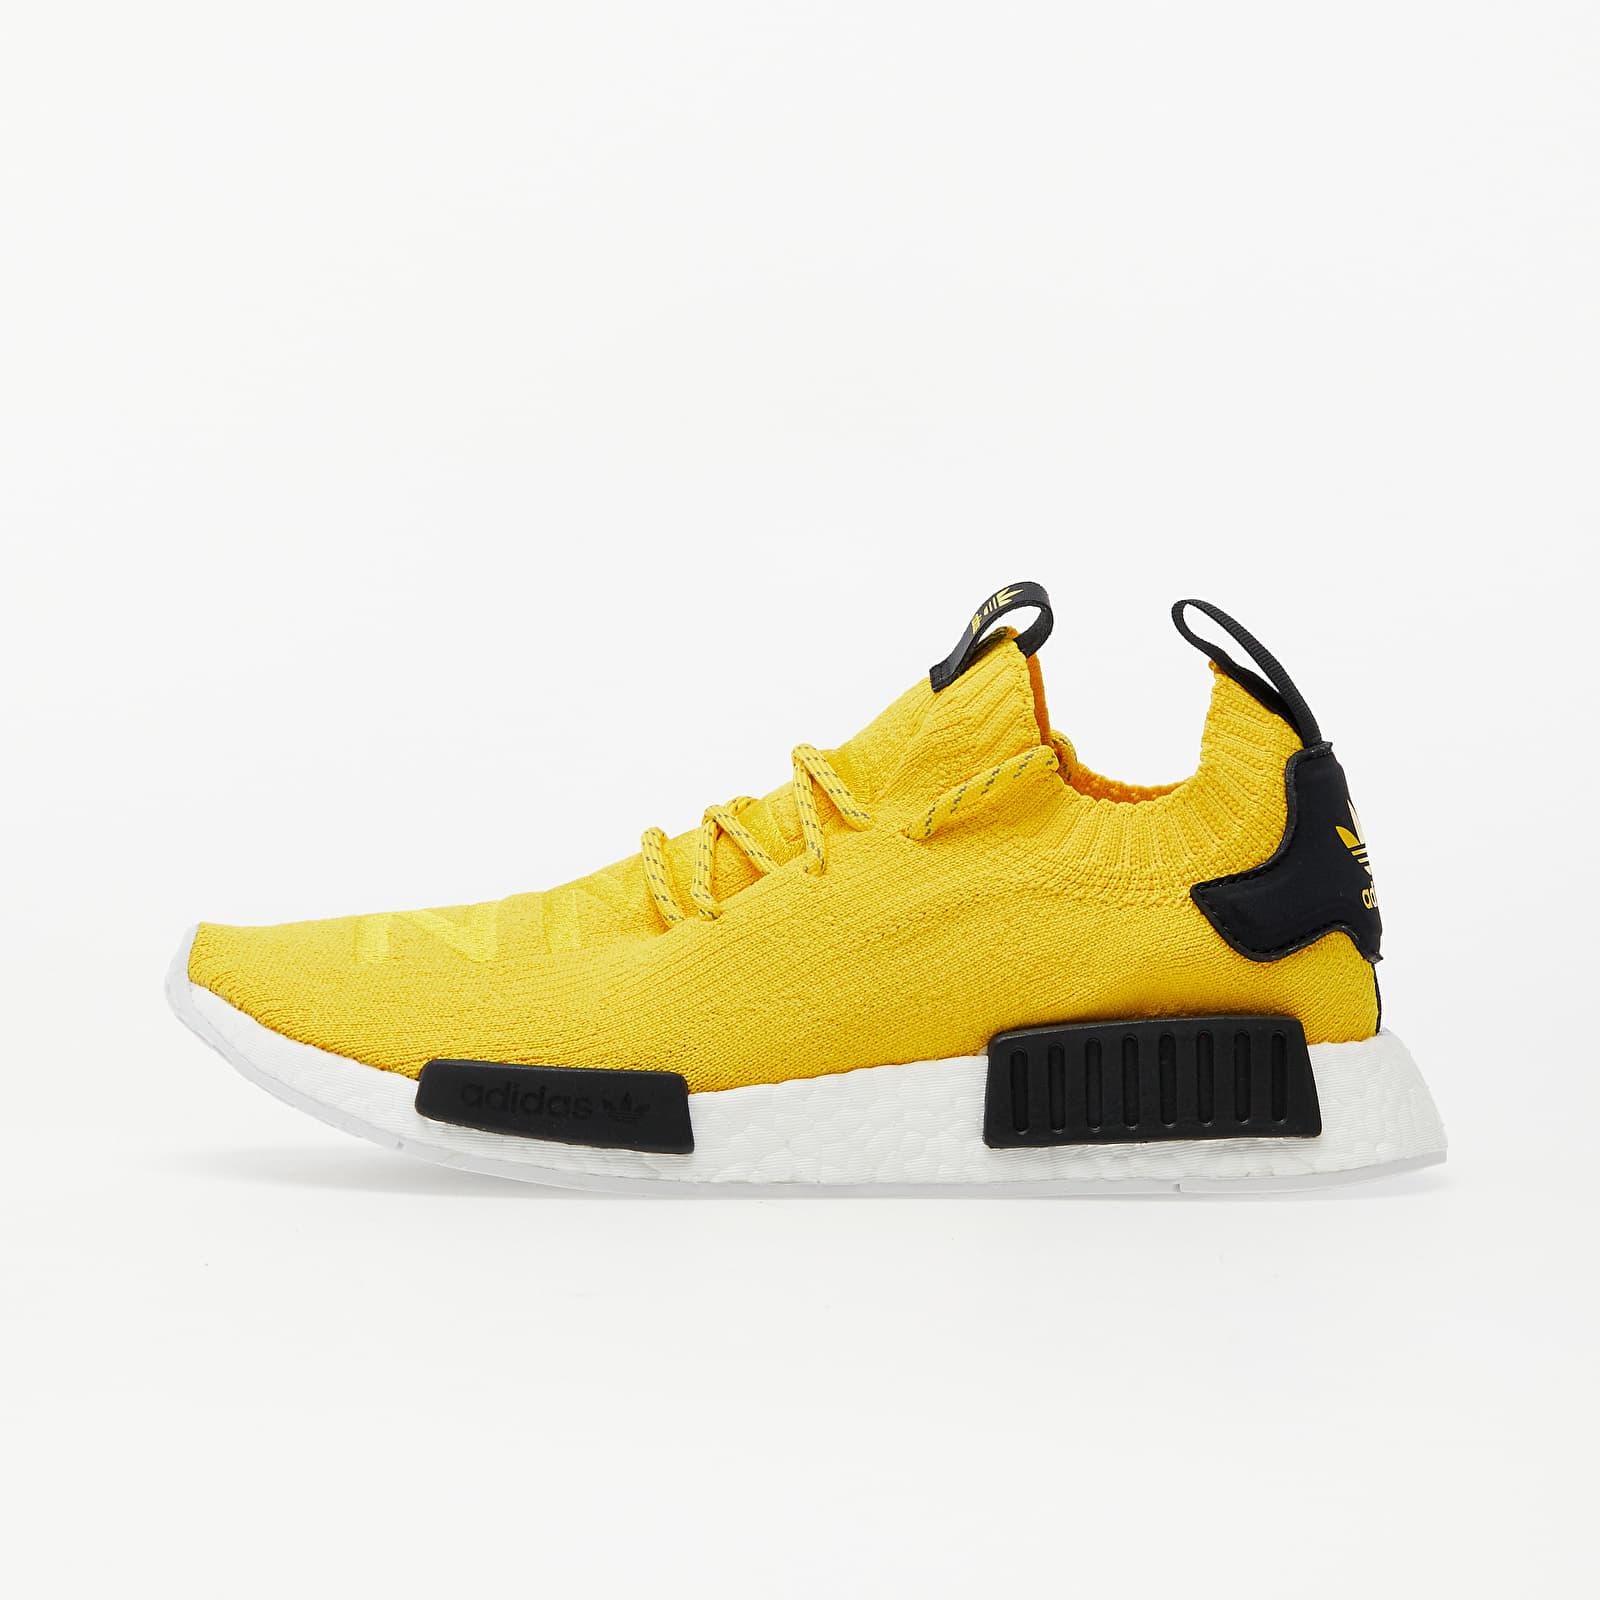 adidas NMD_R1 Primeknit Eqt Yellow/ Eqt Yellow/ Core Black EUR 38